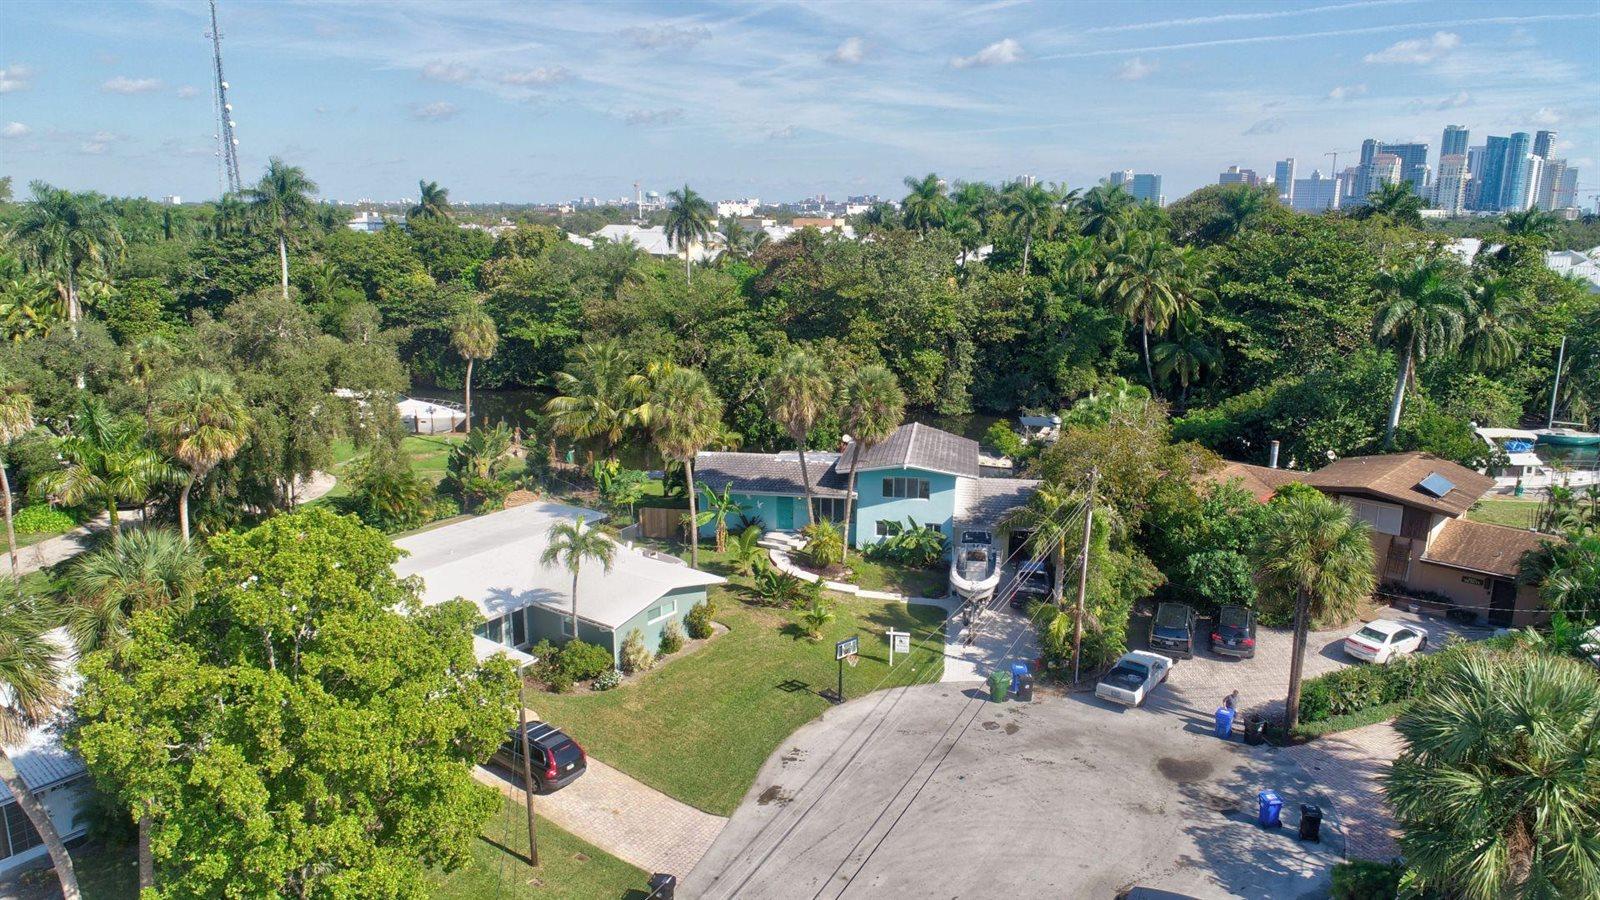 1501 SW 4th Court, Fort Lauderdale, FL 33312